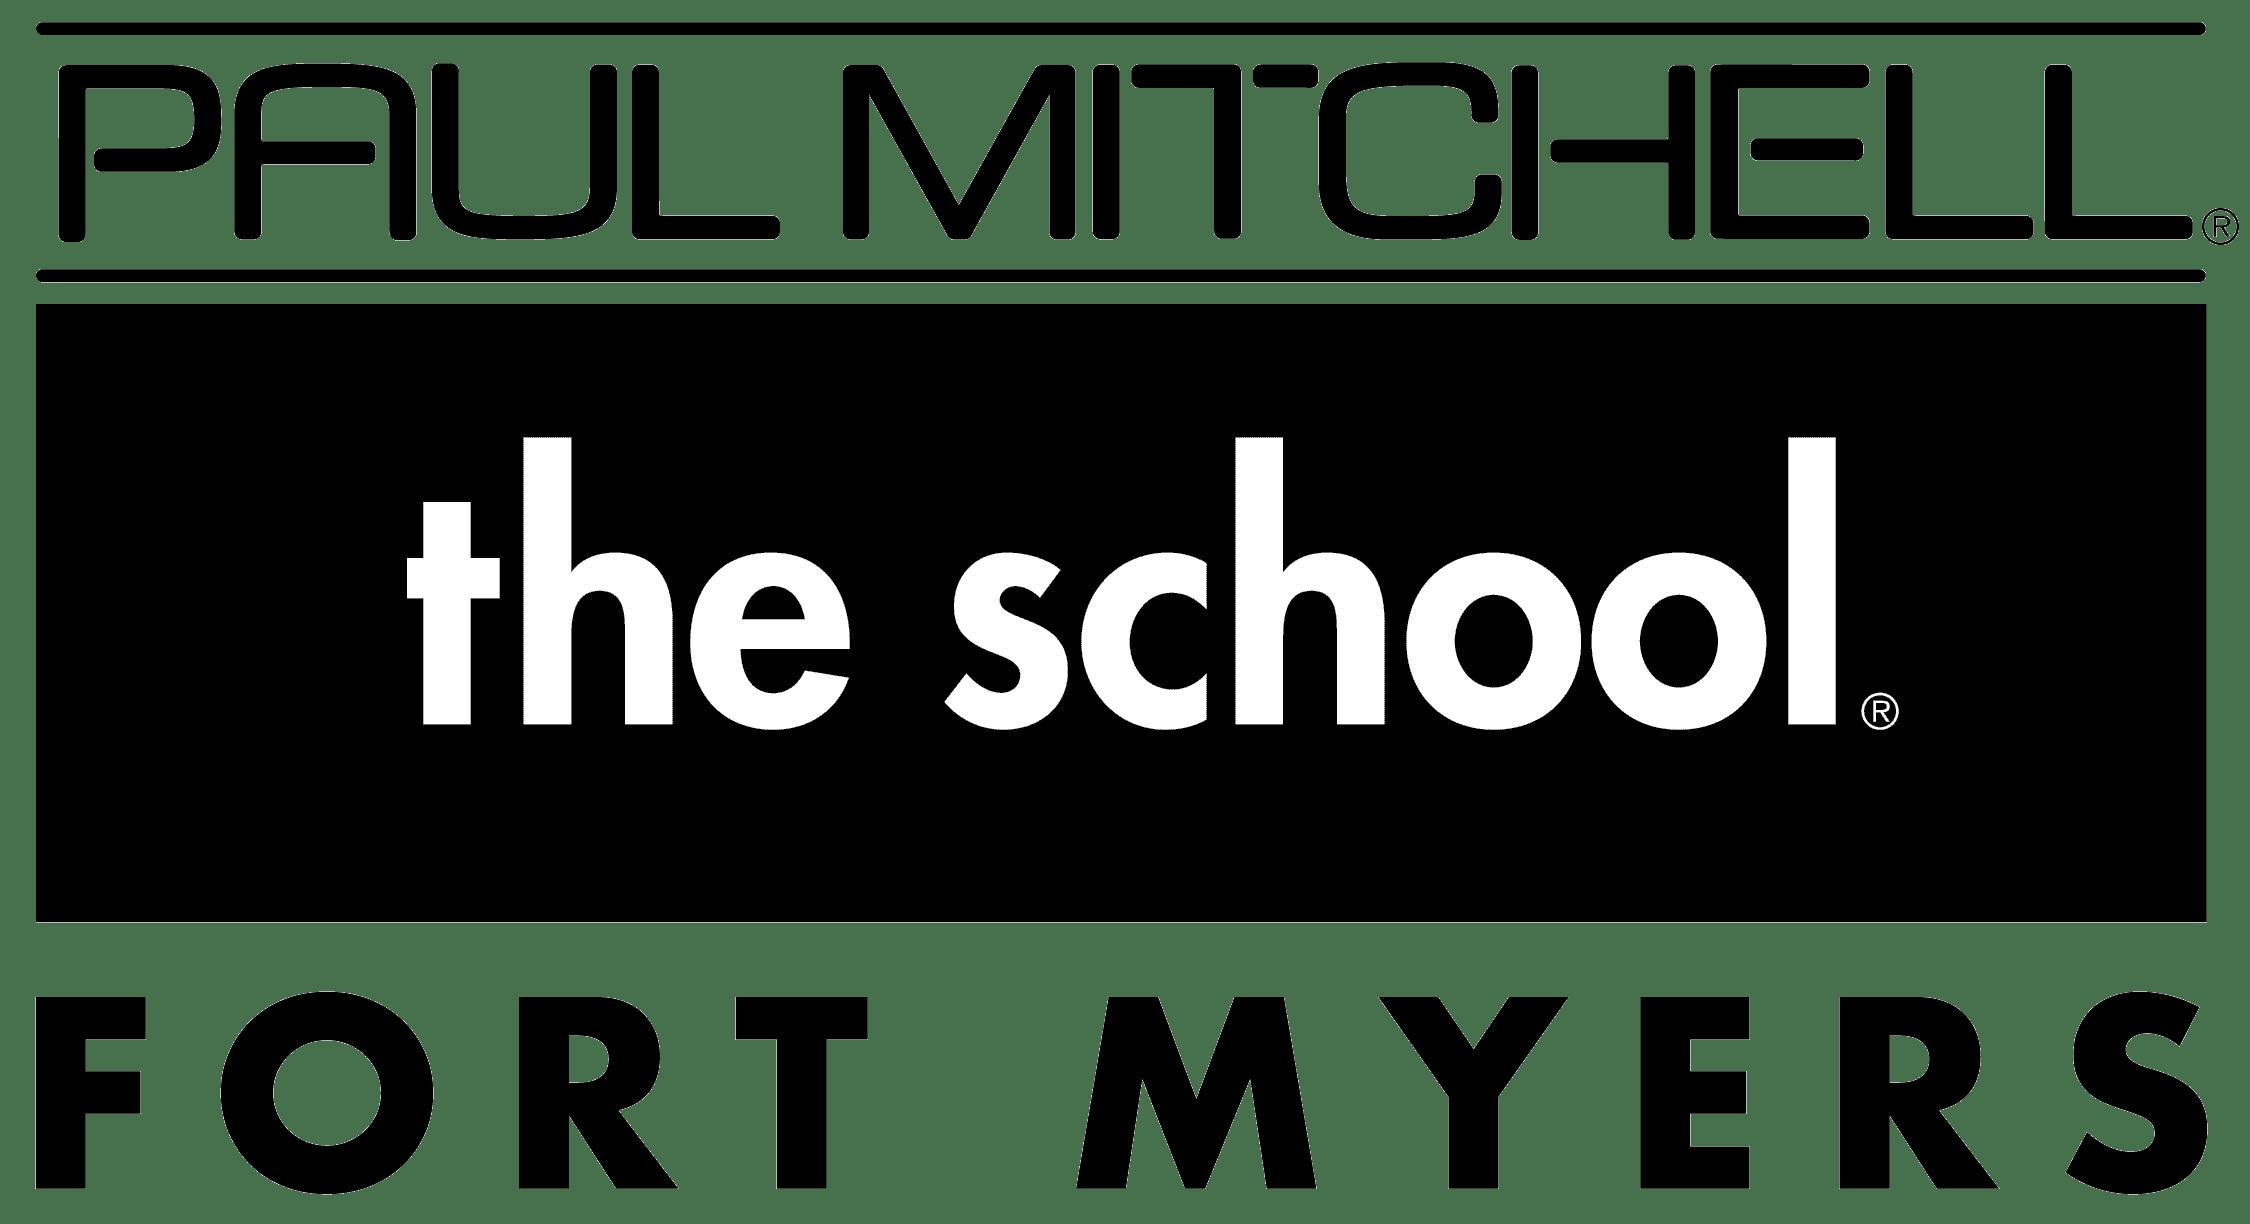 Naples Fashion Week™ Sponsor - Paul Mitchell, The School, Fort Myers, FL